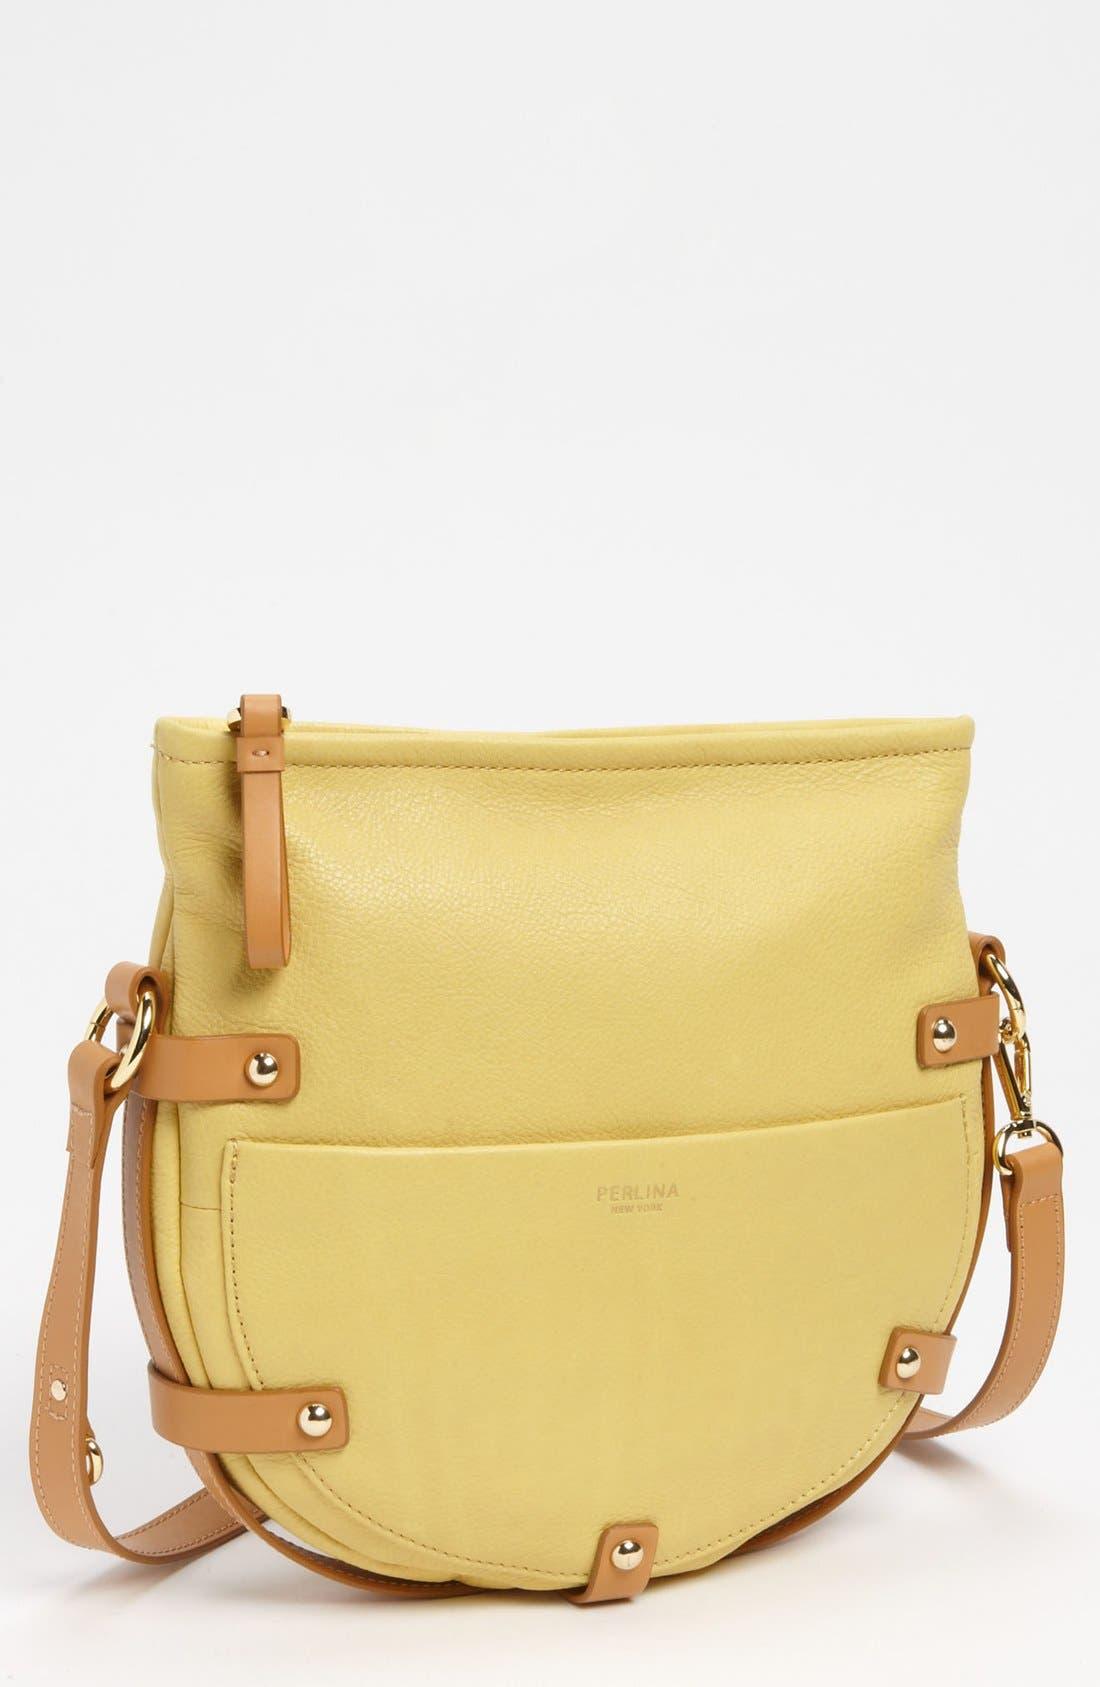 Main Image - Perlina 'Lucia' Crossbody Bag